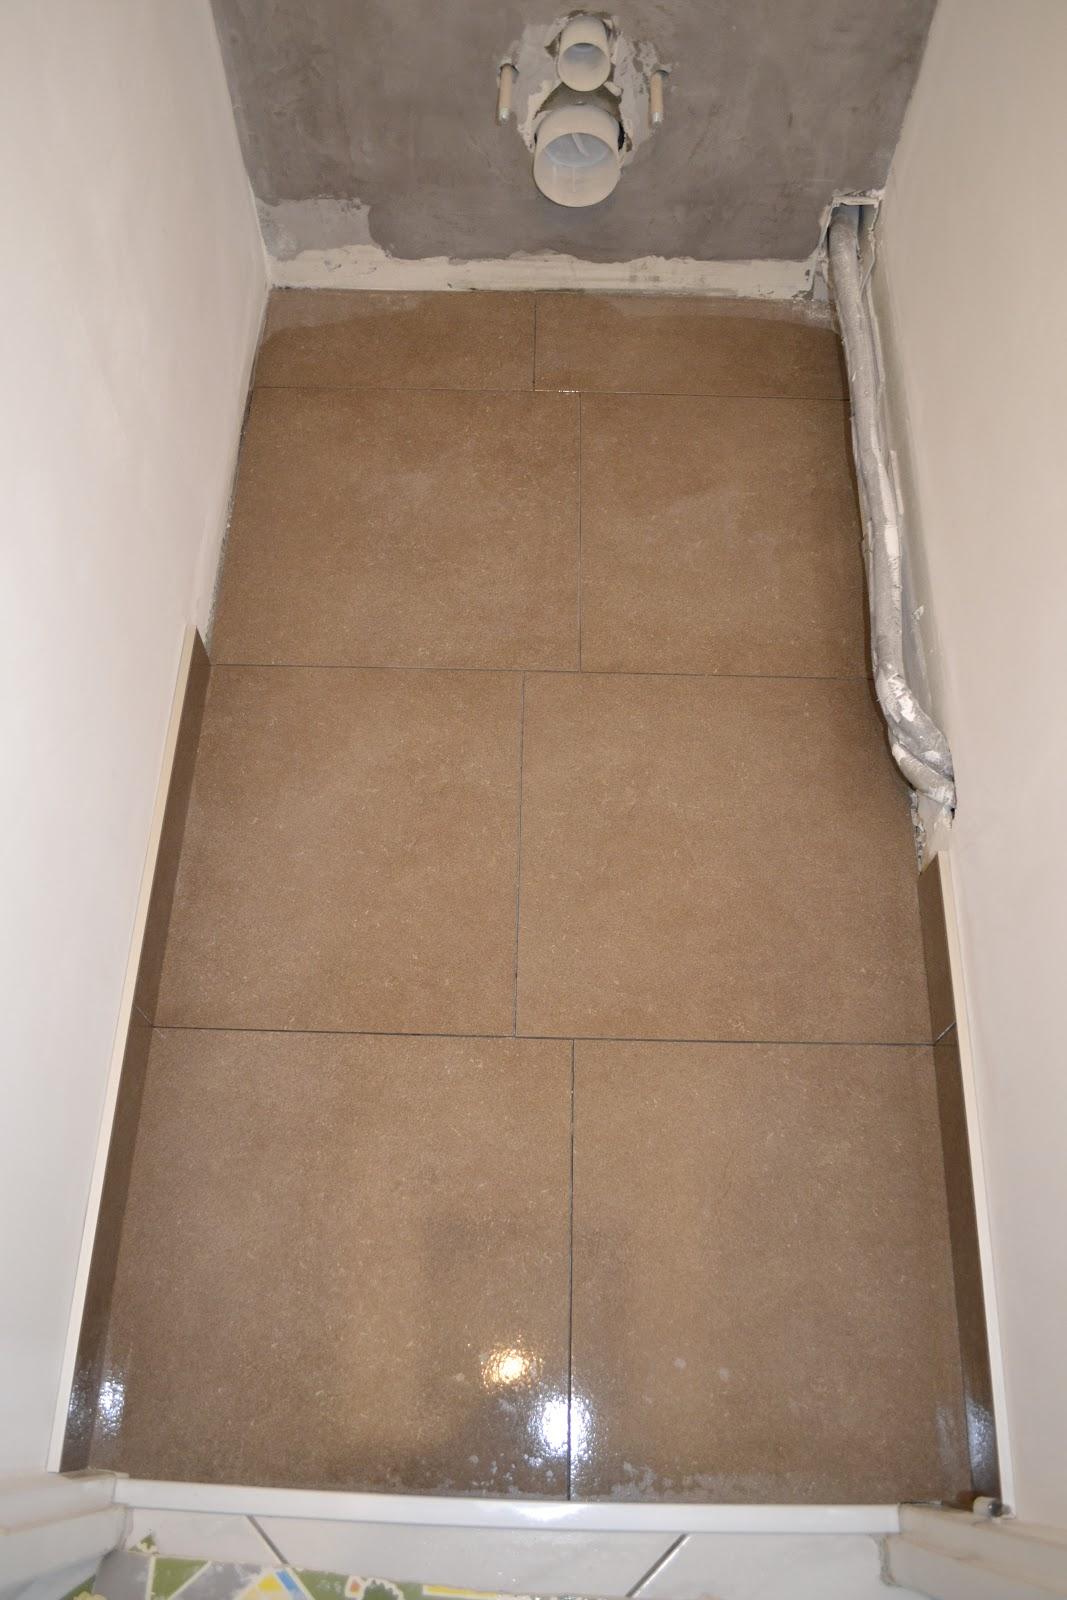 Toilette suspendue habillage b ton cir gris cendre sol 45x45 julienbugnetcarrelage - Habillage escalier beton cire ...